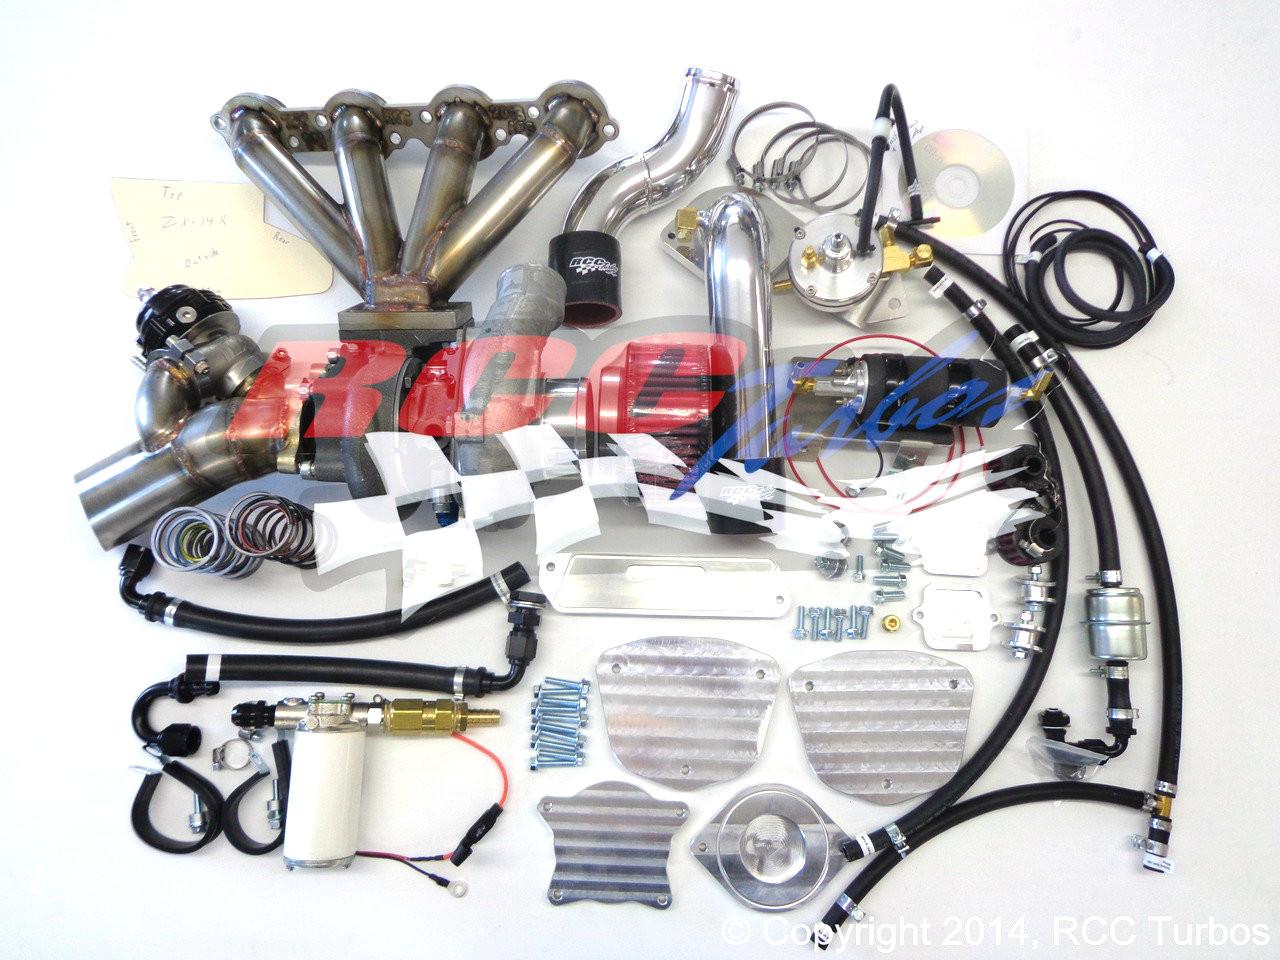 Wiring Harness 2008 Zx14 Starting Know About Diagram Chevy Truck Ebay Kawasaki Turbo Kit Schnitz Racing Rh Store Schnitzracing Com